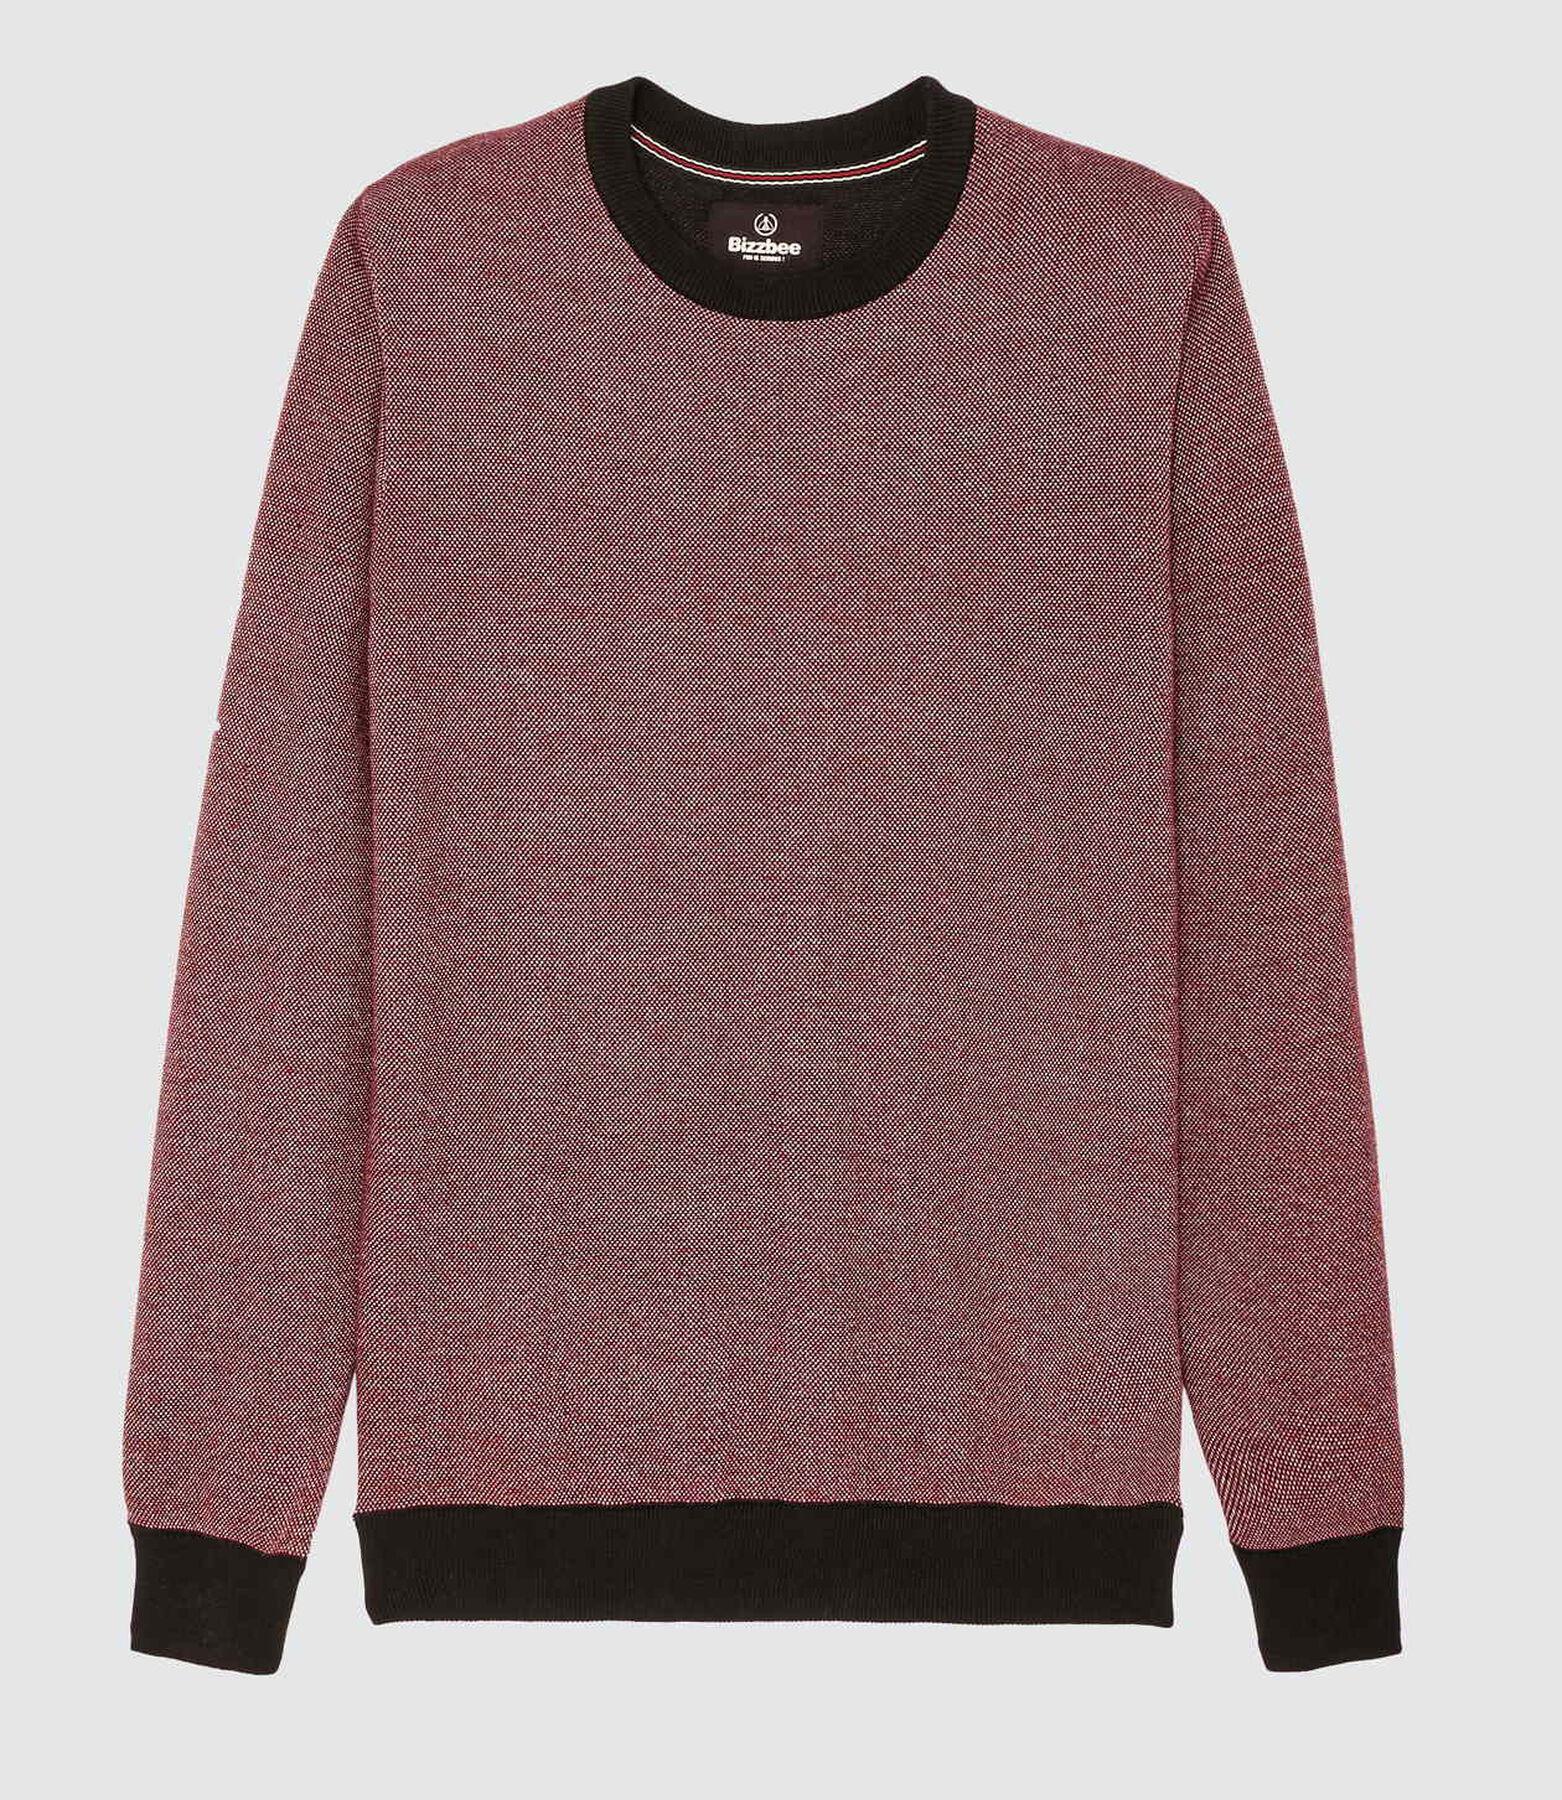 Pull au tricotage fantaisie